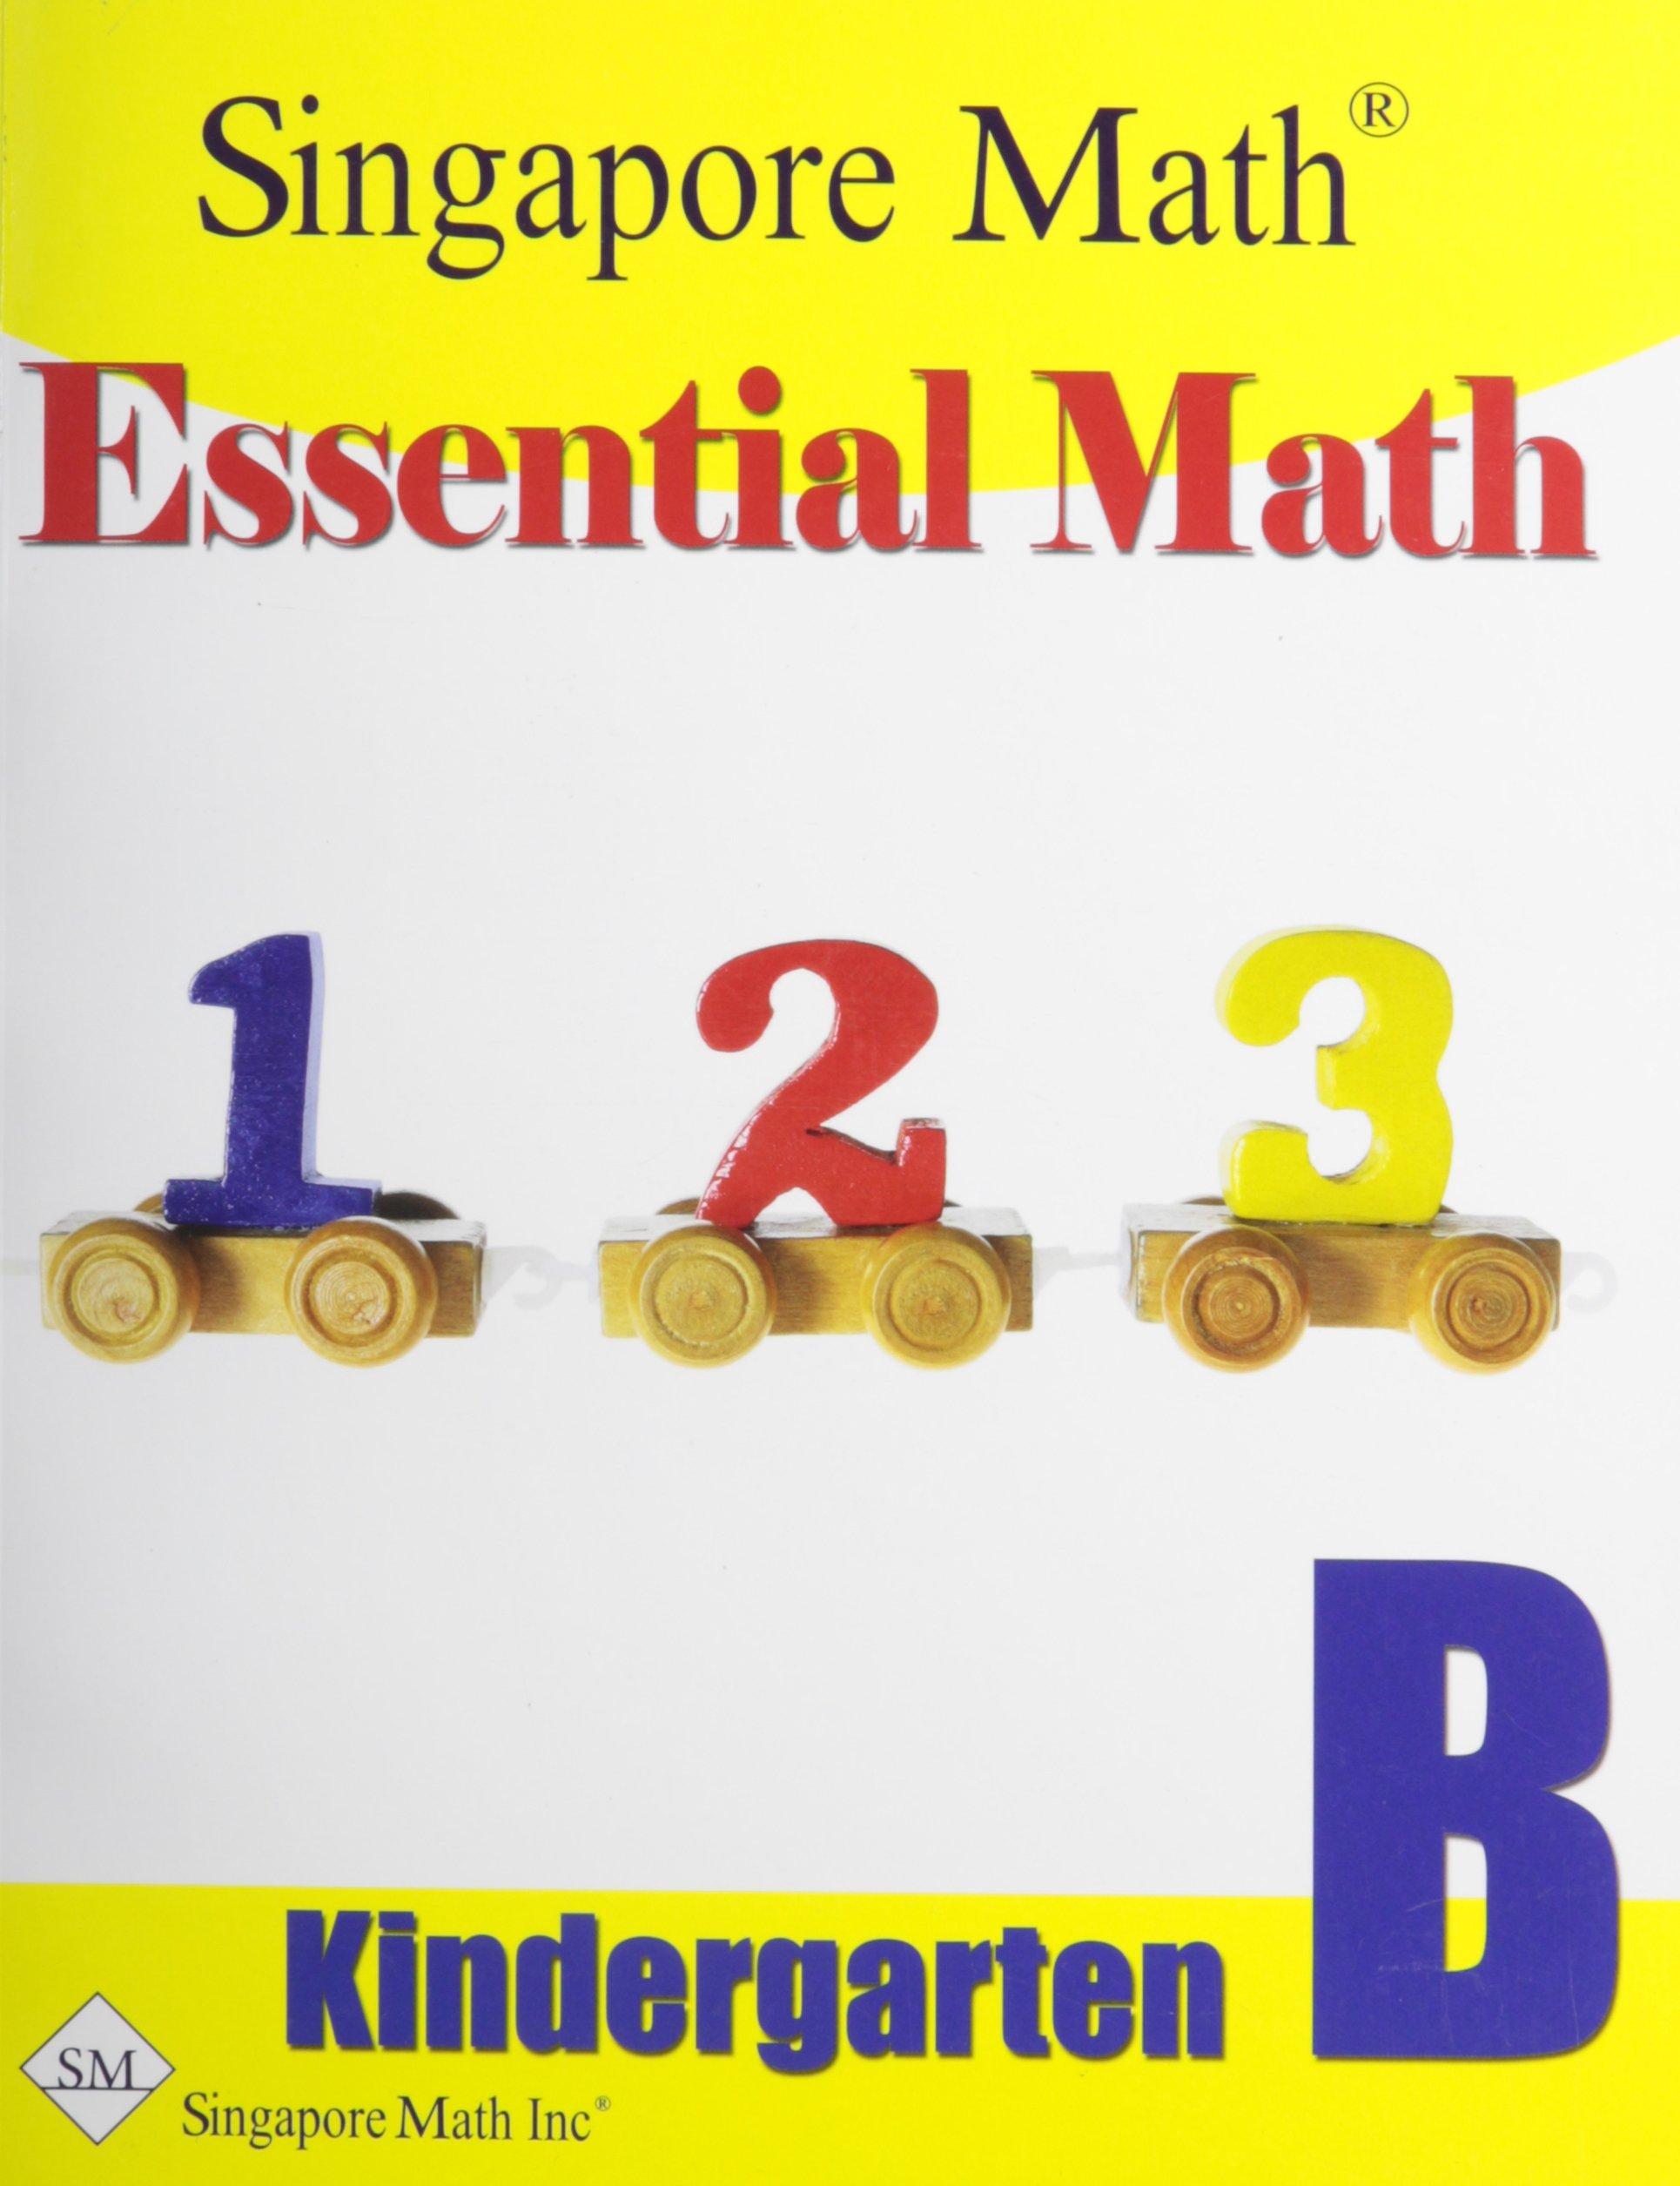 Essential Math Kindergarten B: 9781932906158: Amazon.com: Books